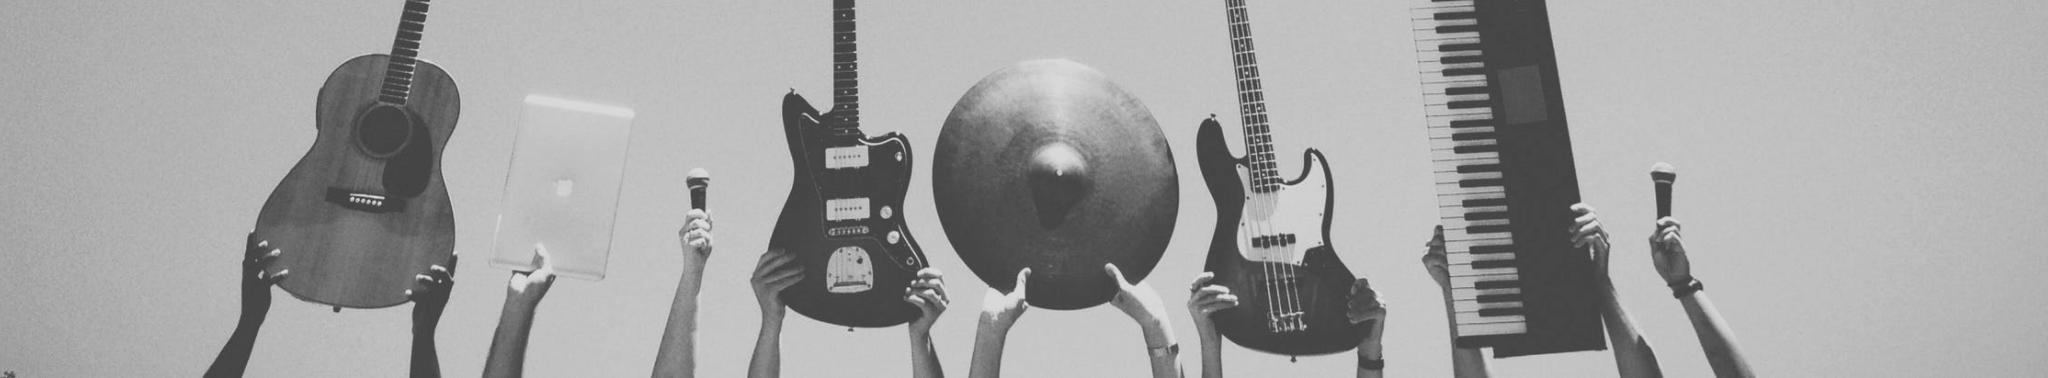 cymatics-soundfonts-instruments